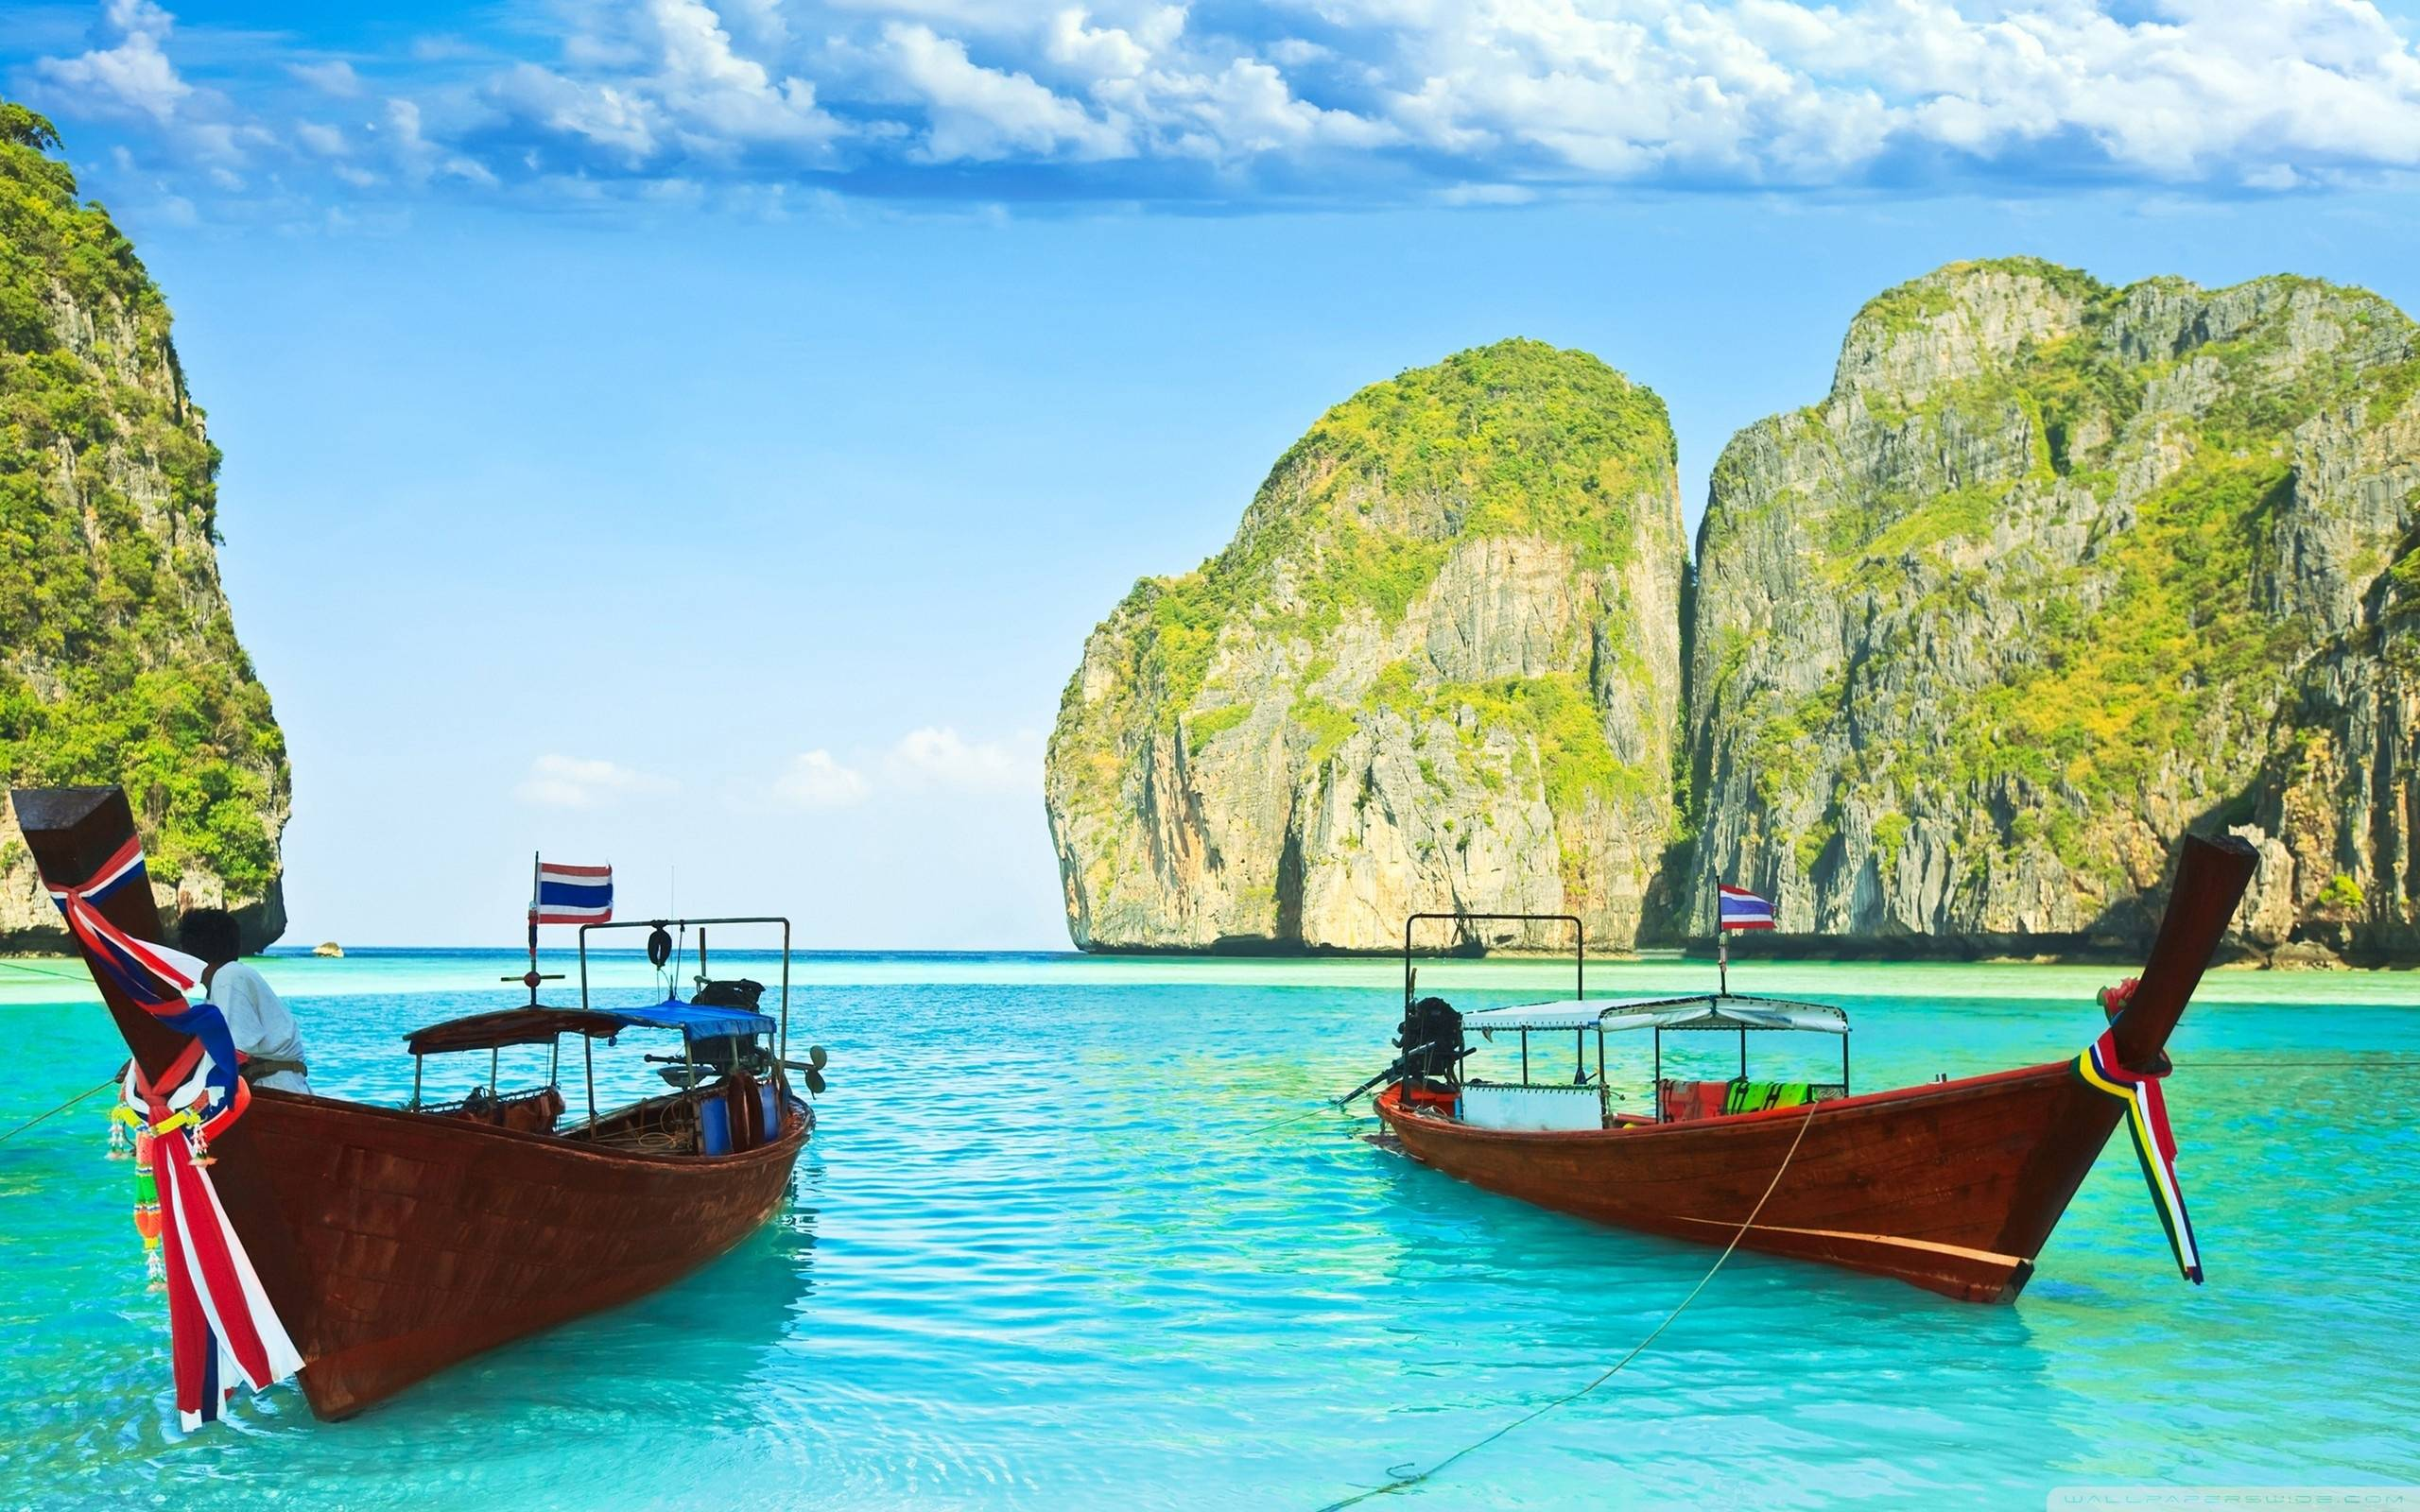 maya bay beach thailand images wallpaper beach powericare